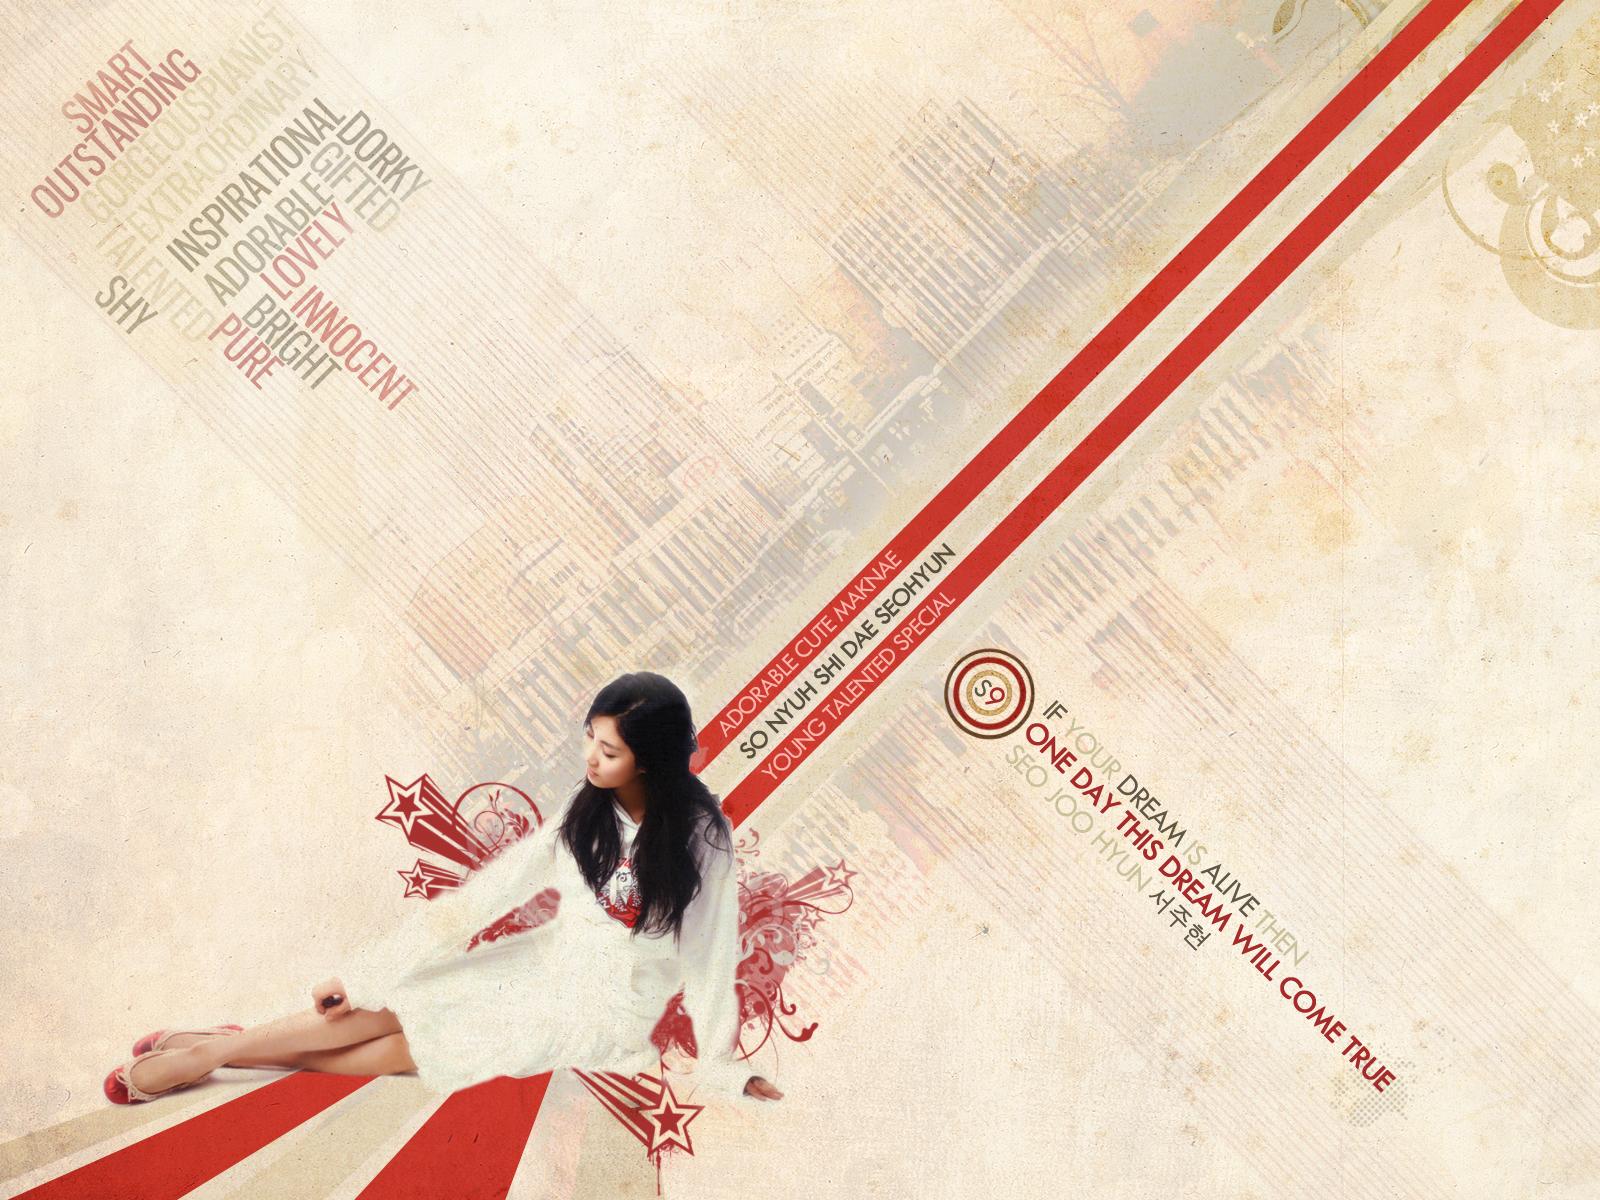 [PICS] Seohyun Wallpaper Collection Seohyun_Retro_Wallpaper_by_FFVortex